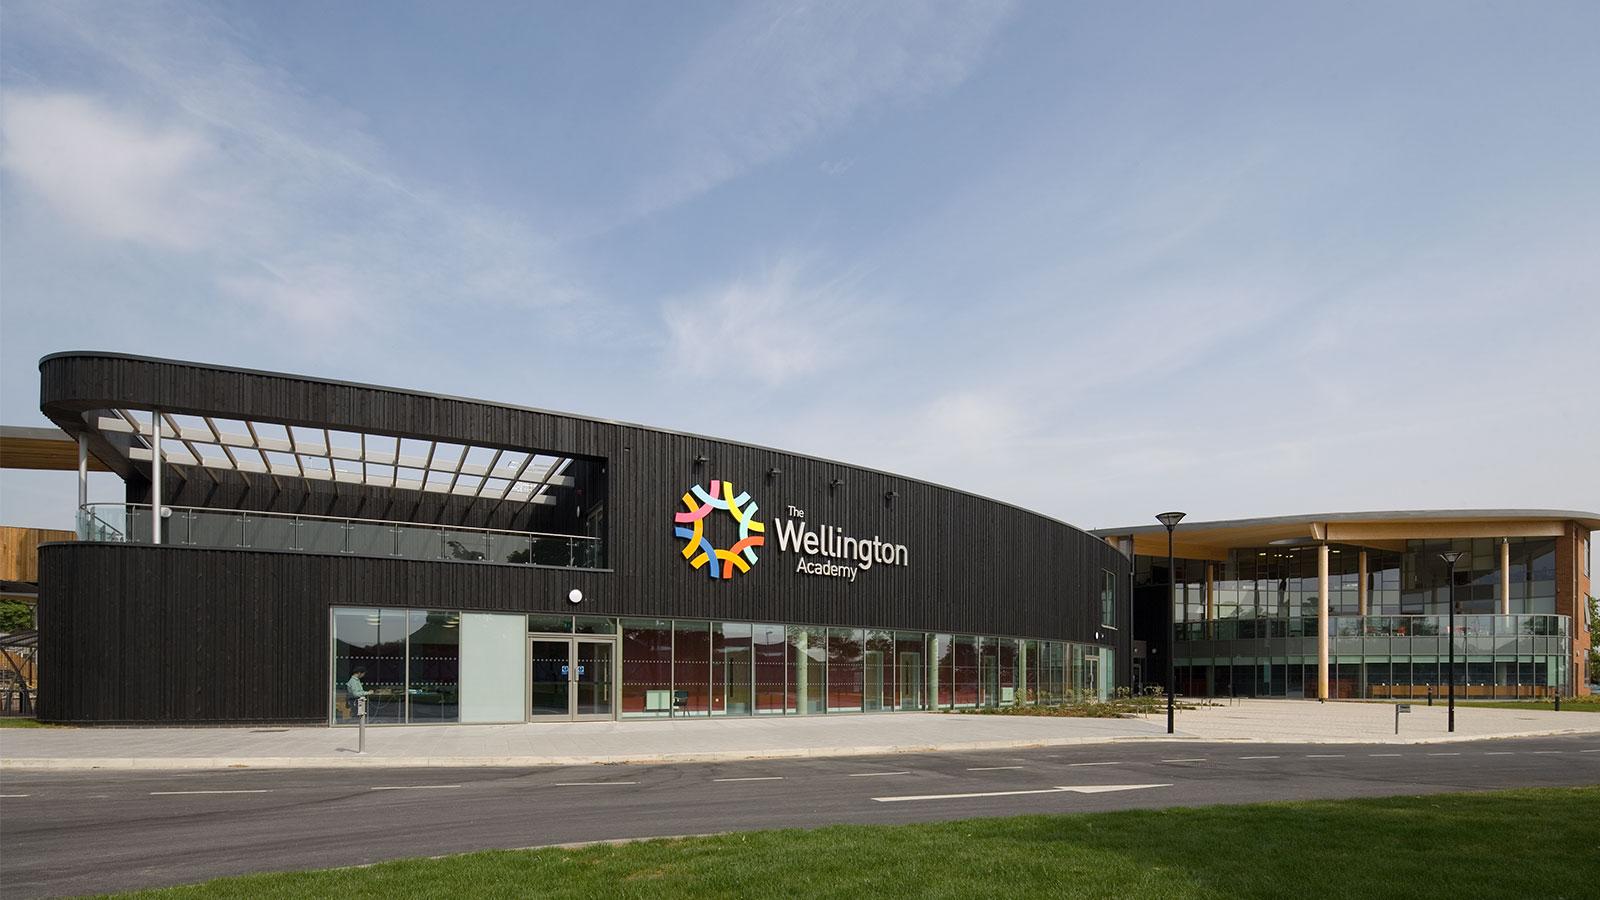 01_wellington-academy_ext3.jpg